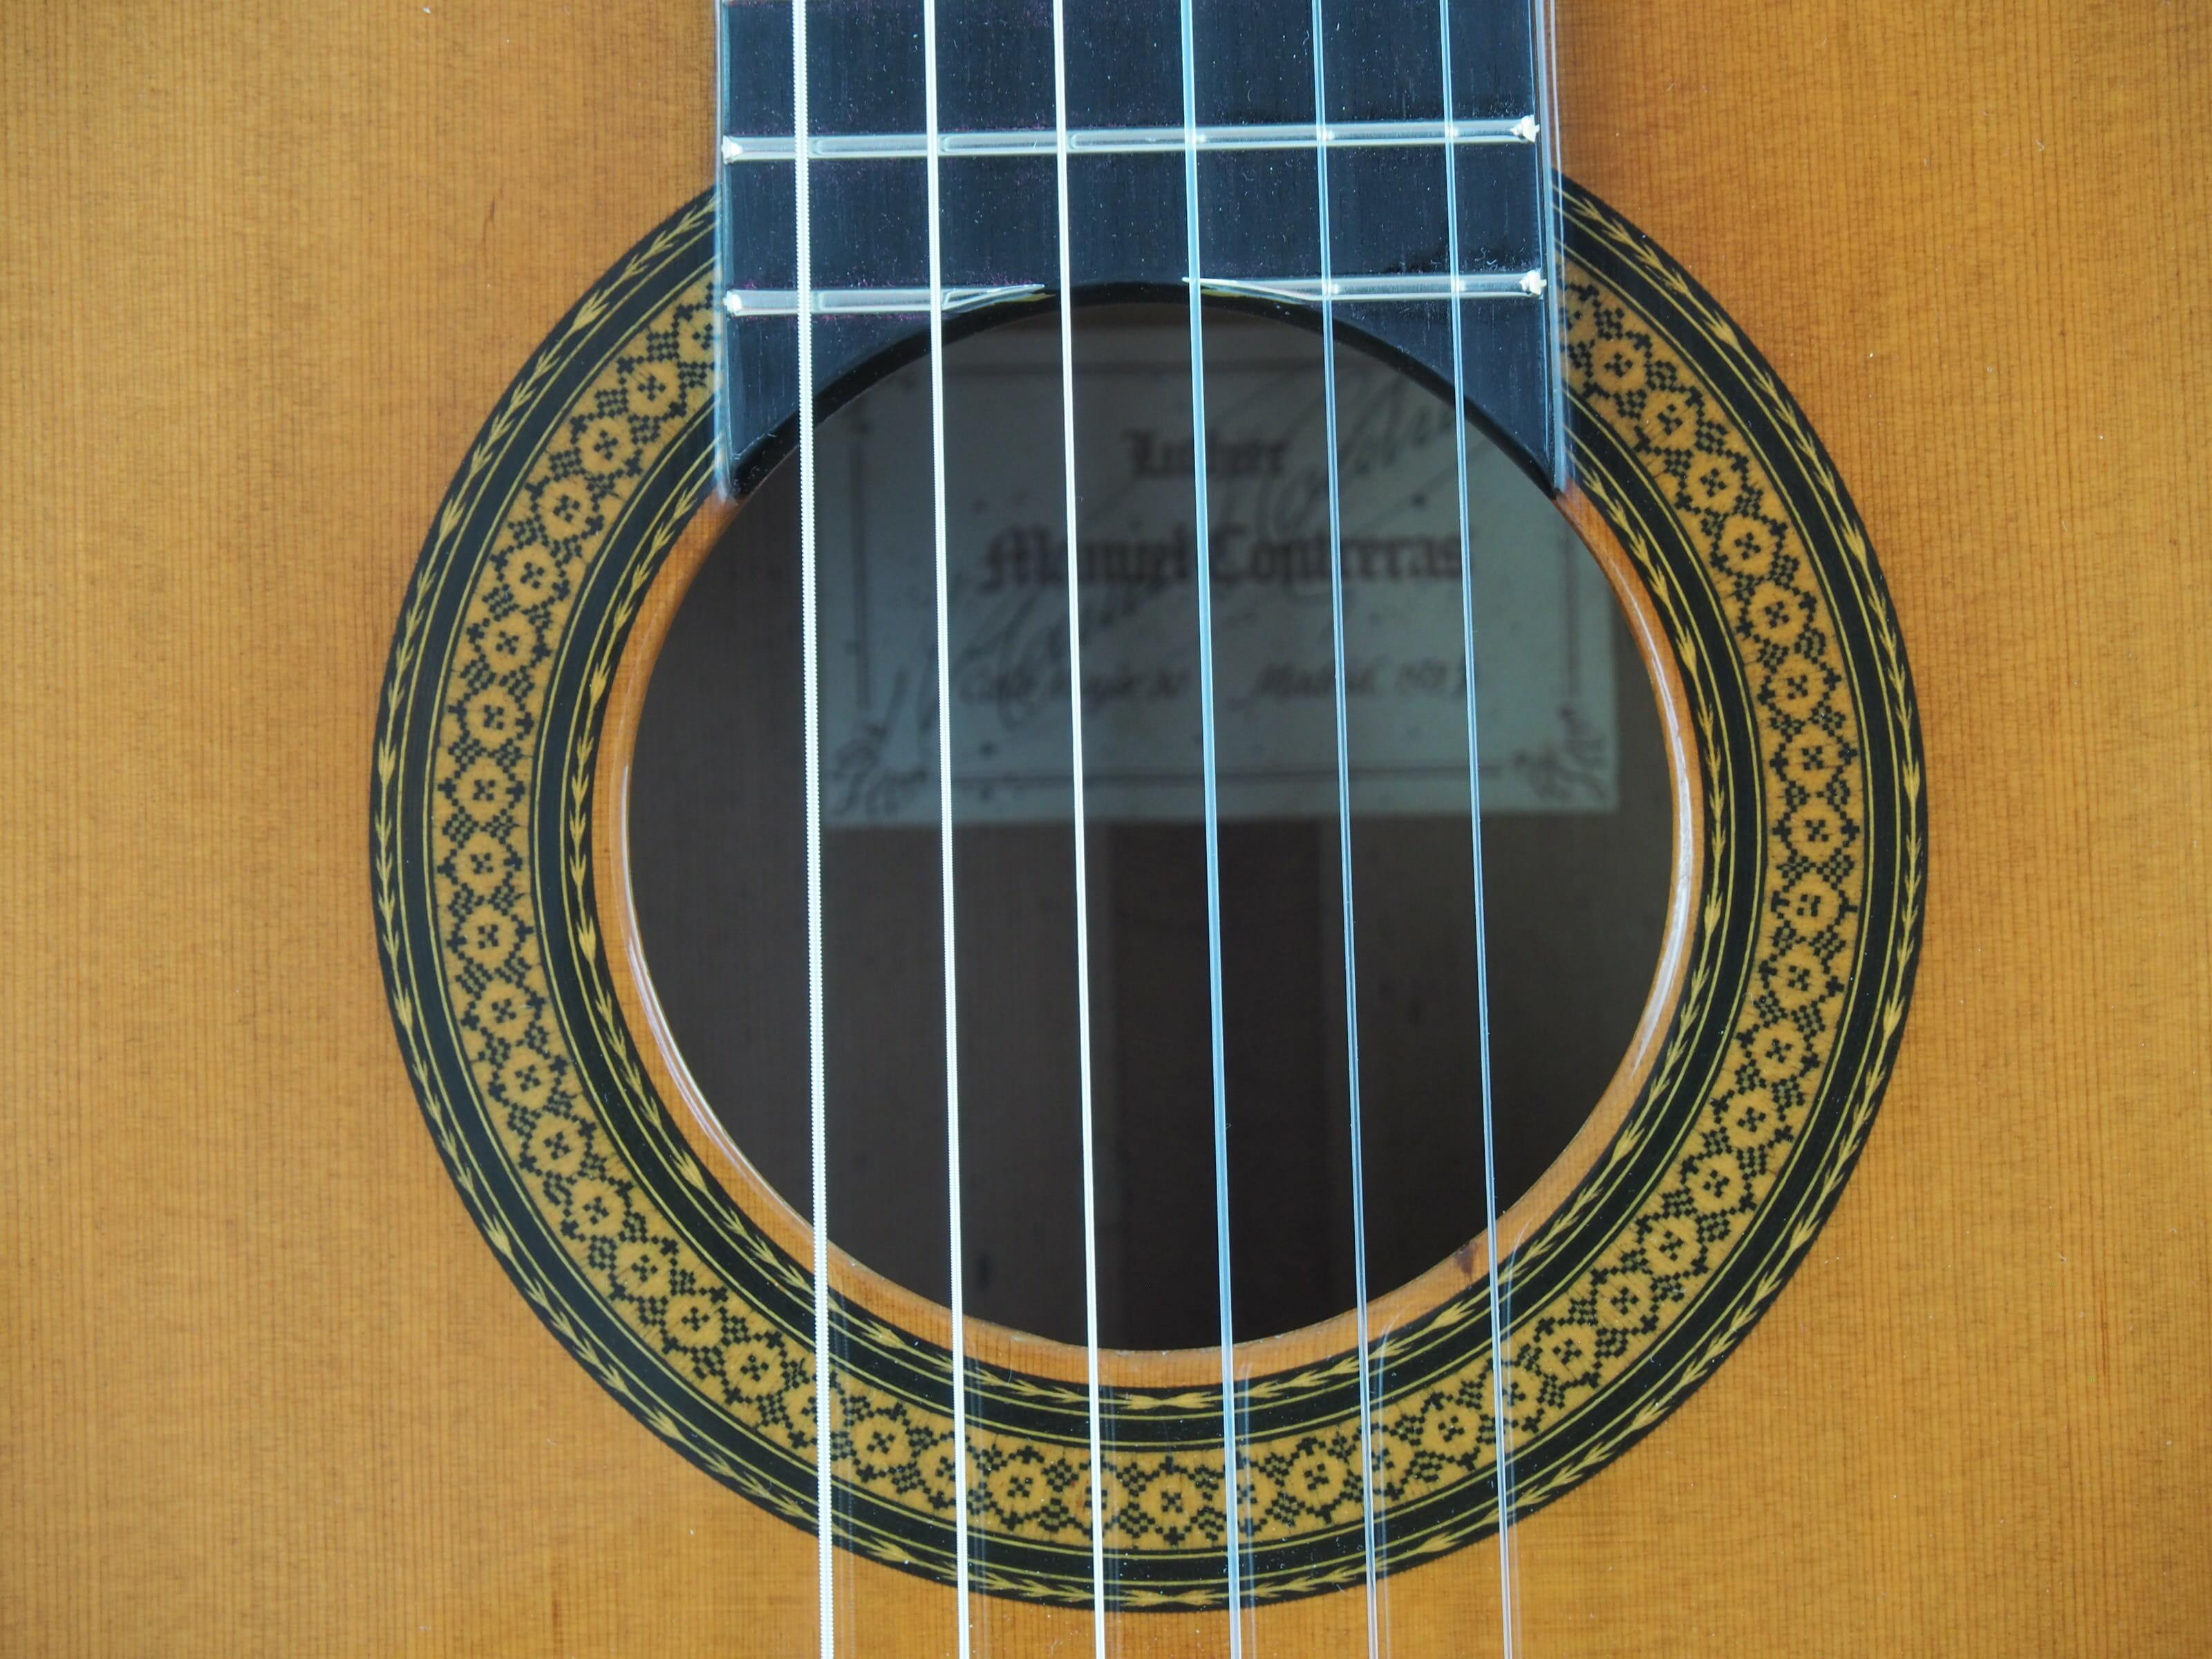 Manuel Contreras guitare classique luthier doble tap 1987 19CON087-05